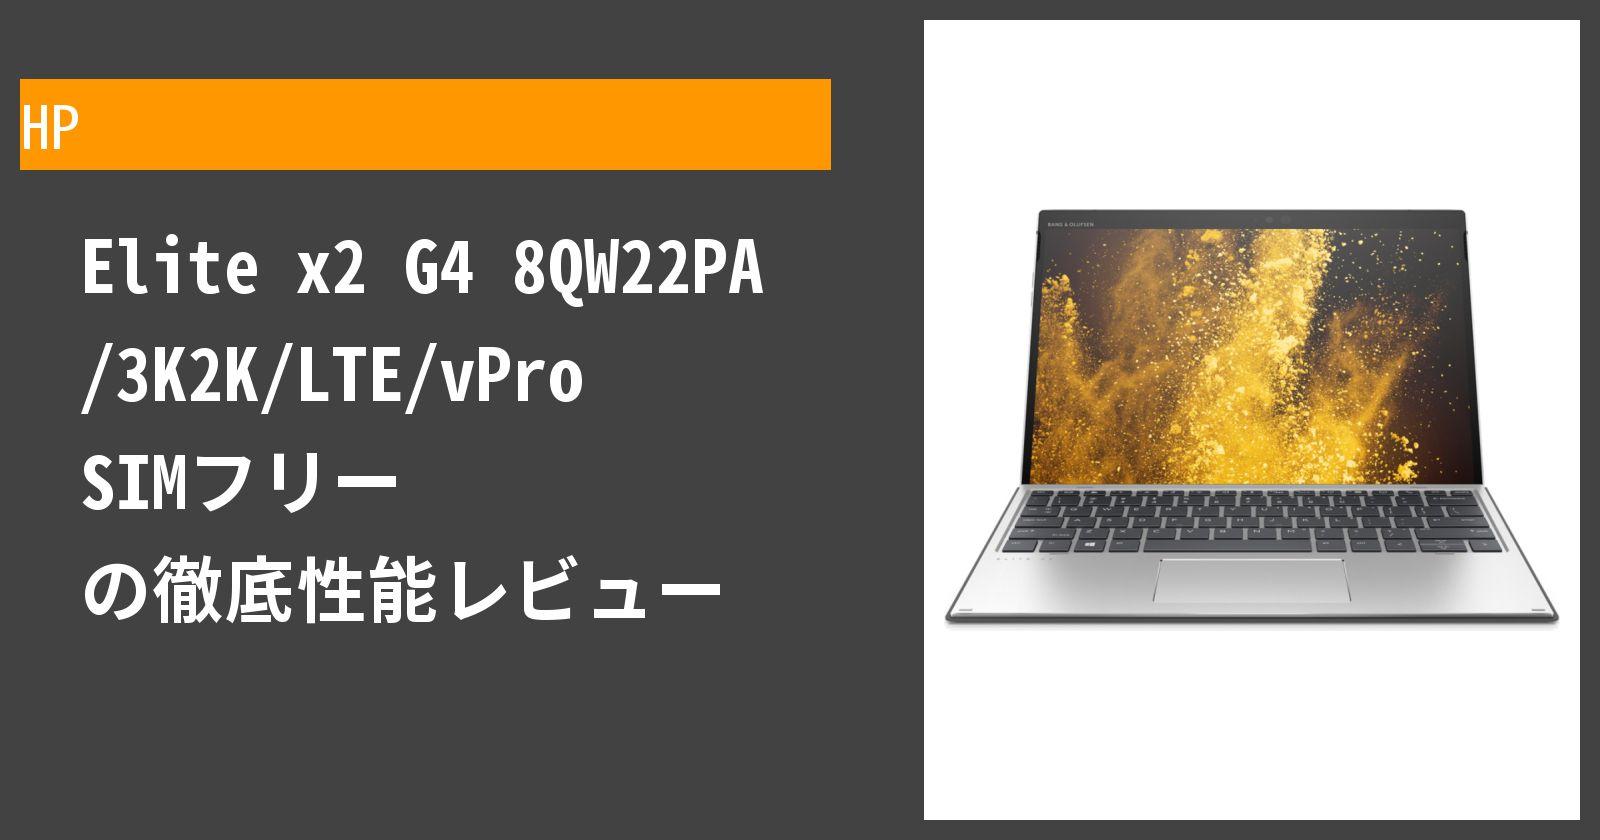 Elite x2 G4 8QW22PA /3K2K/LTE/vPro SIMフリー の徹底性能レビュー